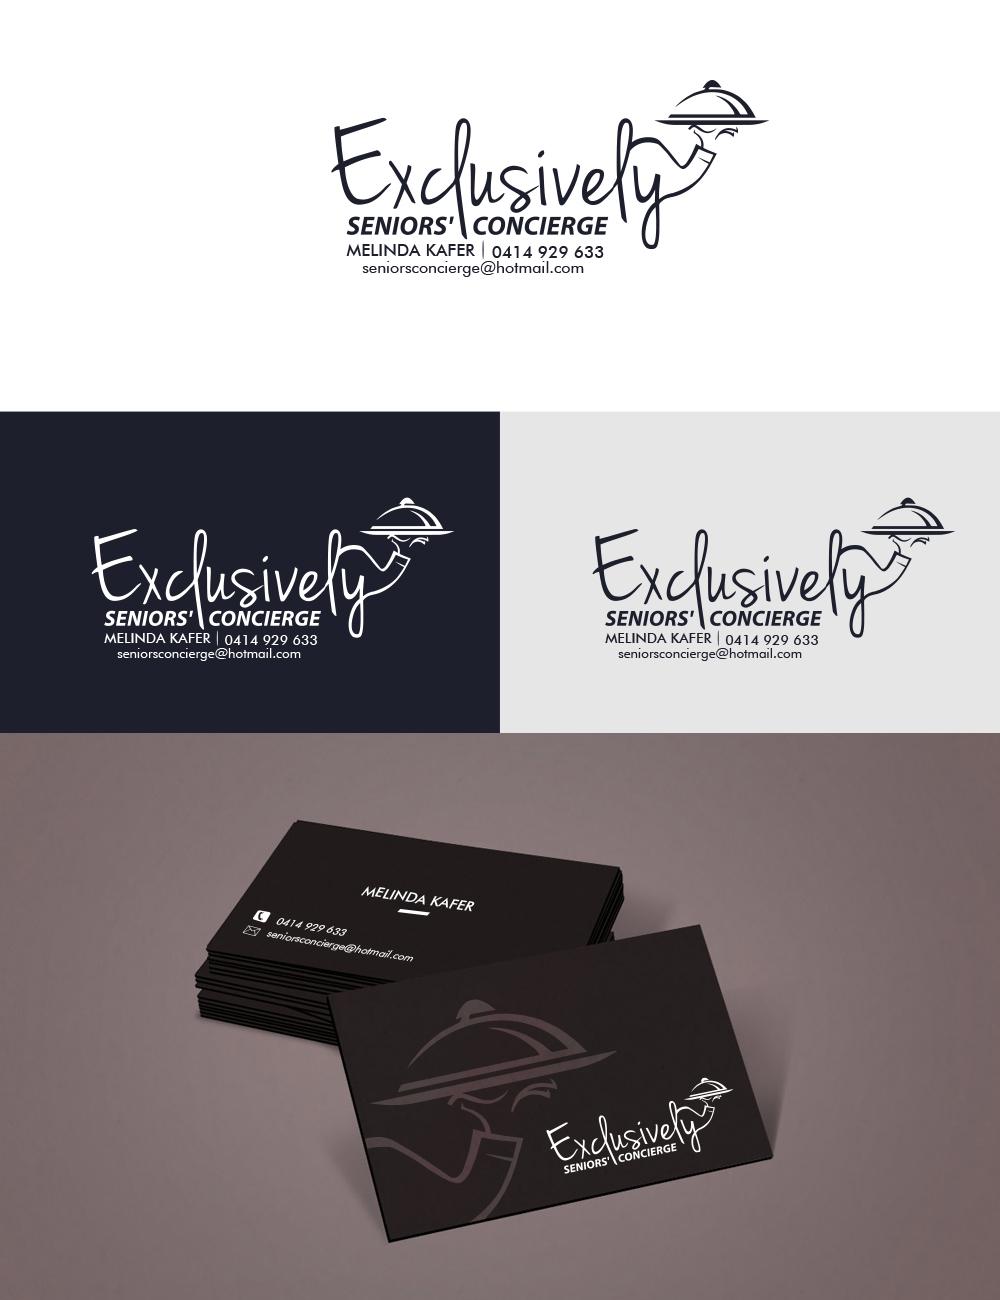 Elegant serious delivery service logo design for exclusive seniors elegant serious delivery service logo design for a company in australia design 14864113 colourmoves